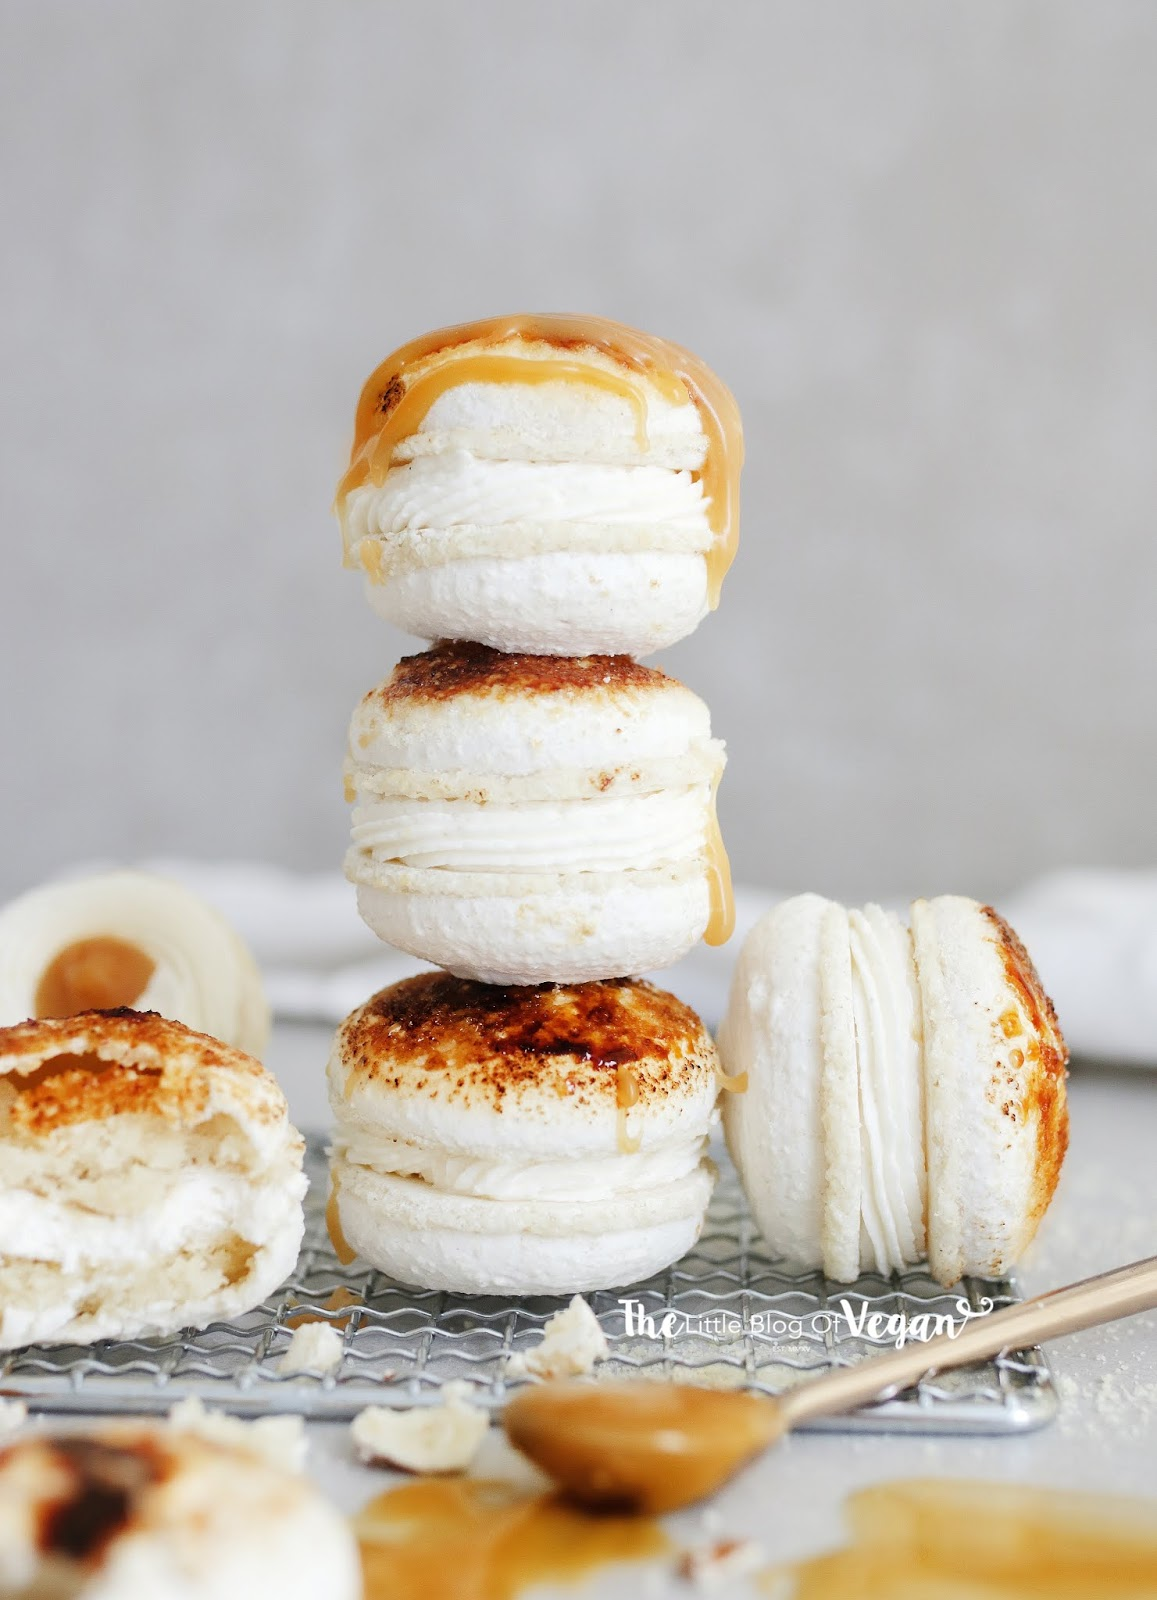 Creme brule macarons